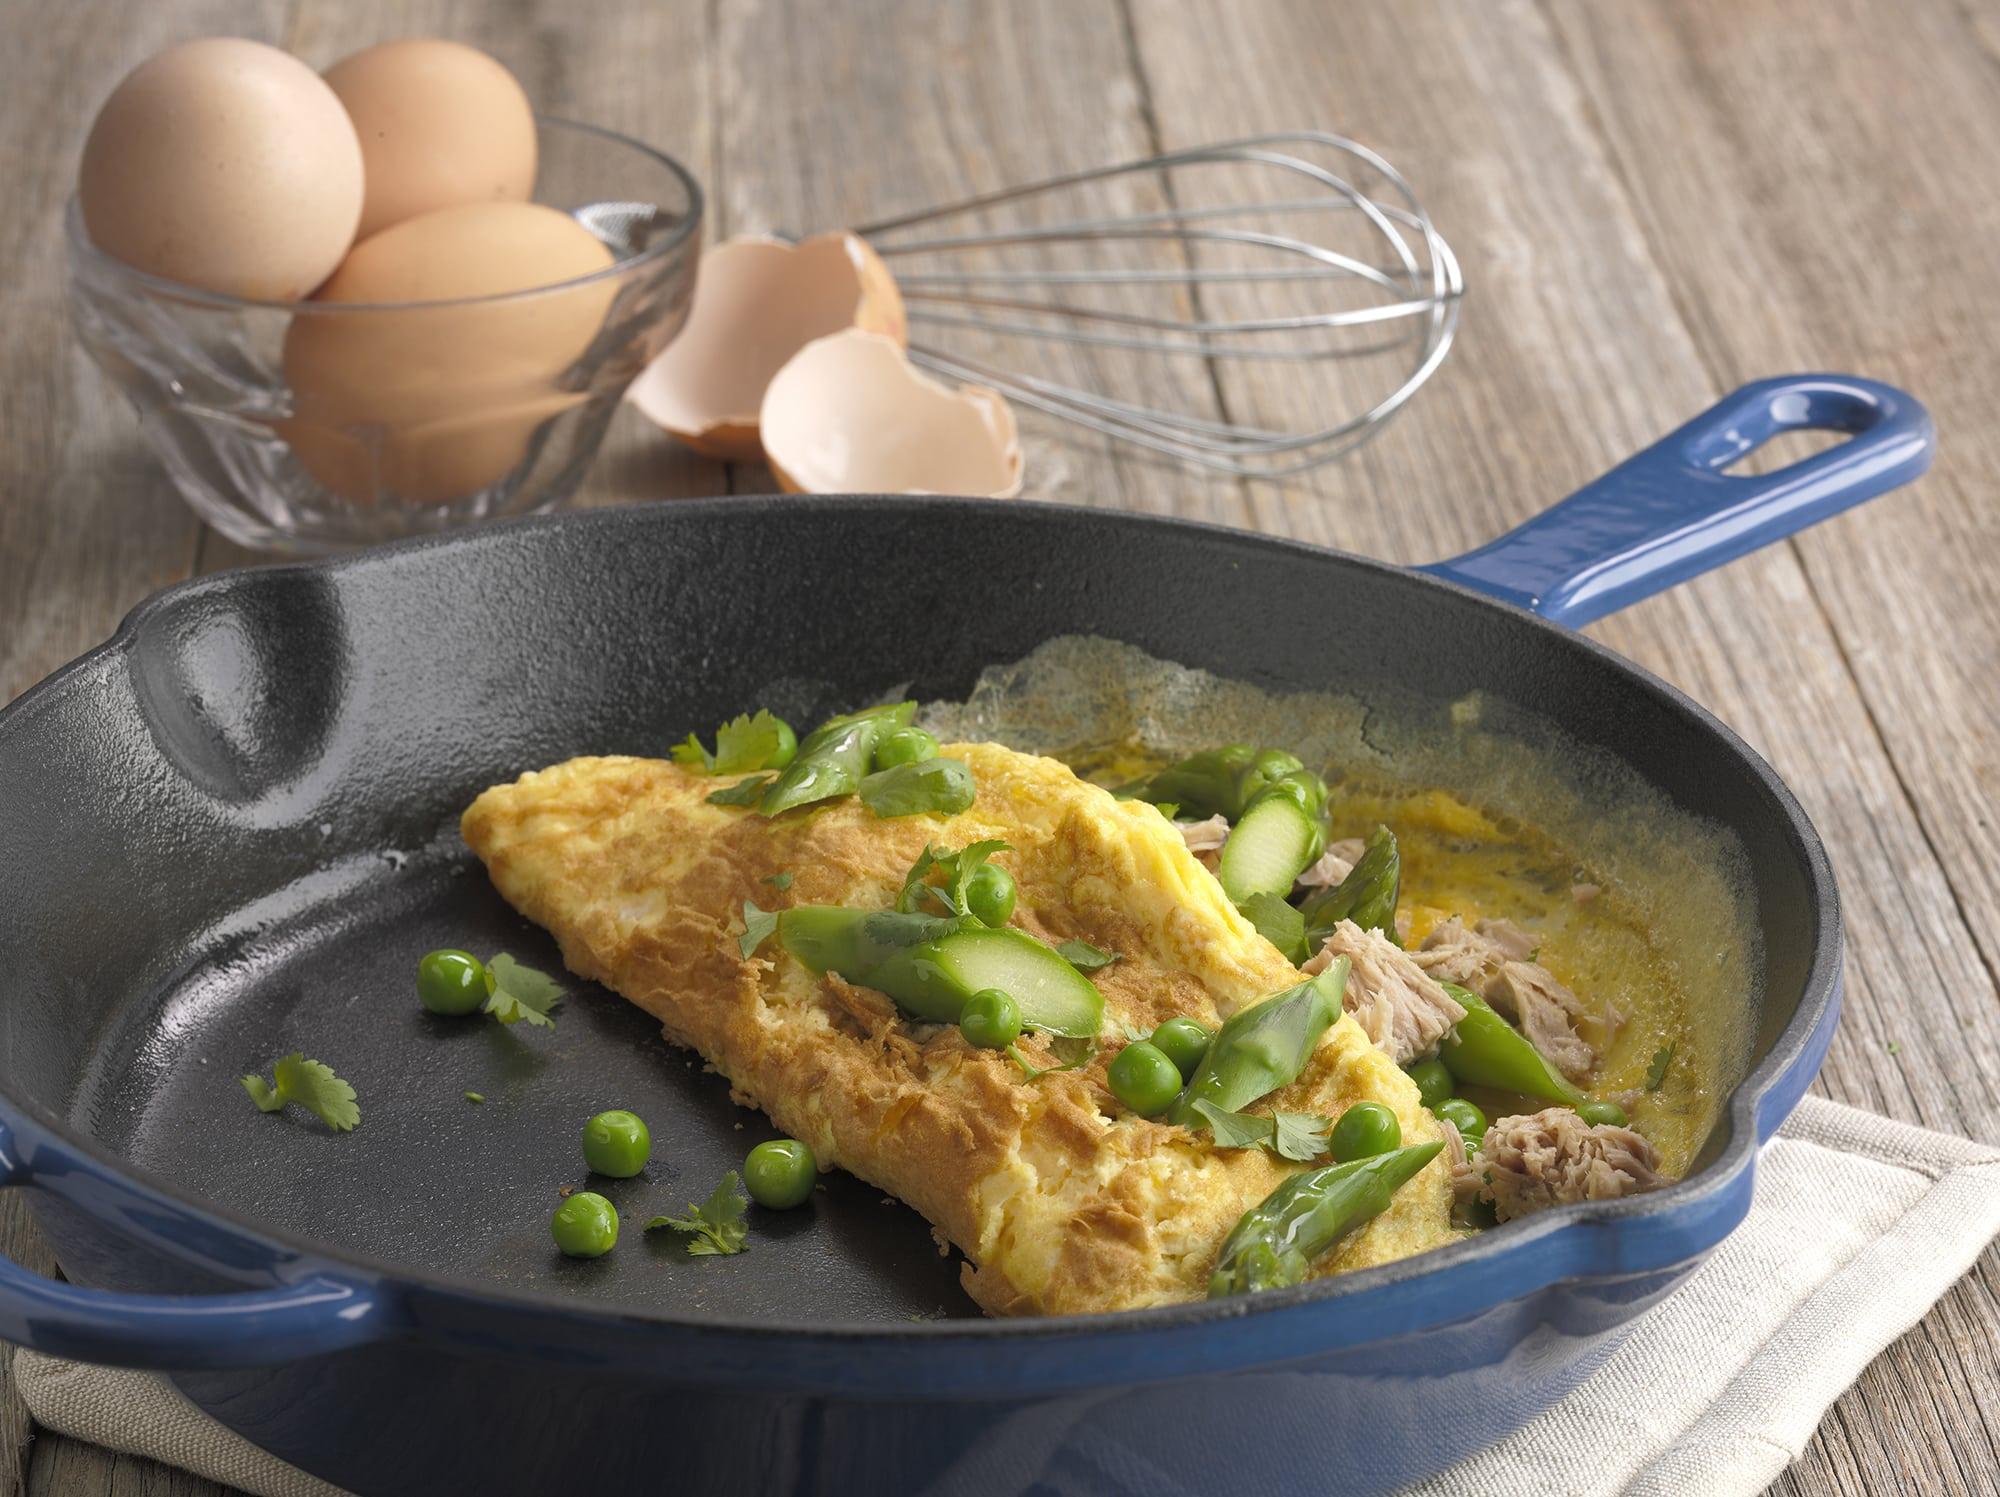 egg, dinner recipes, recipes, omelette, asparagus, tuna